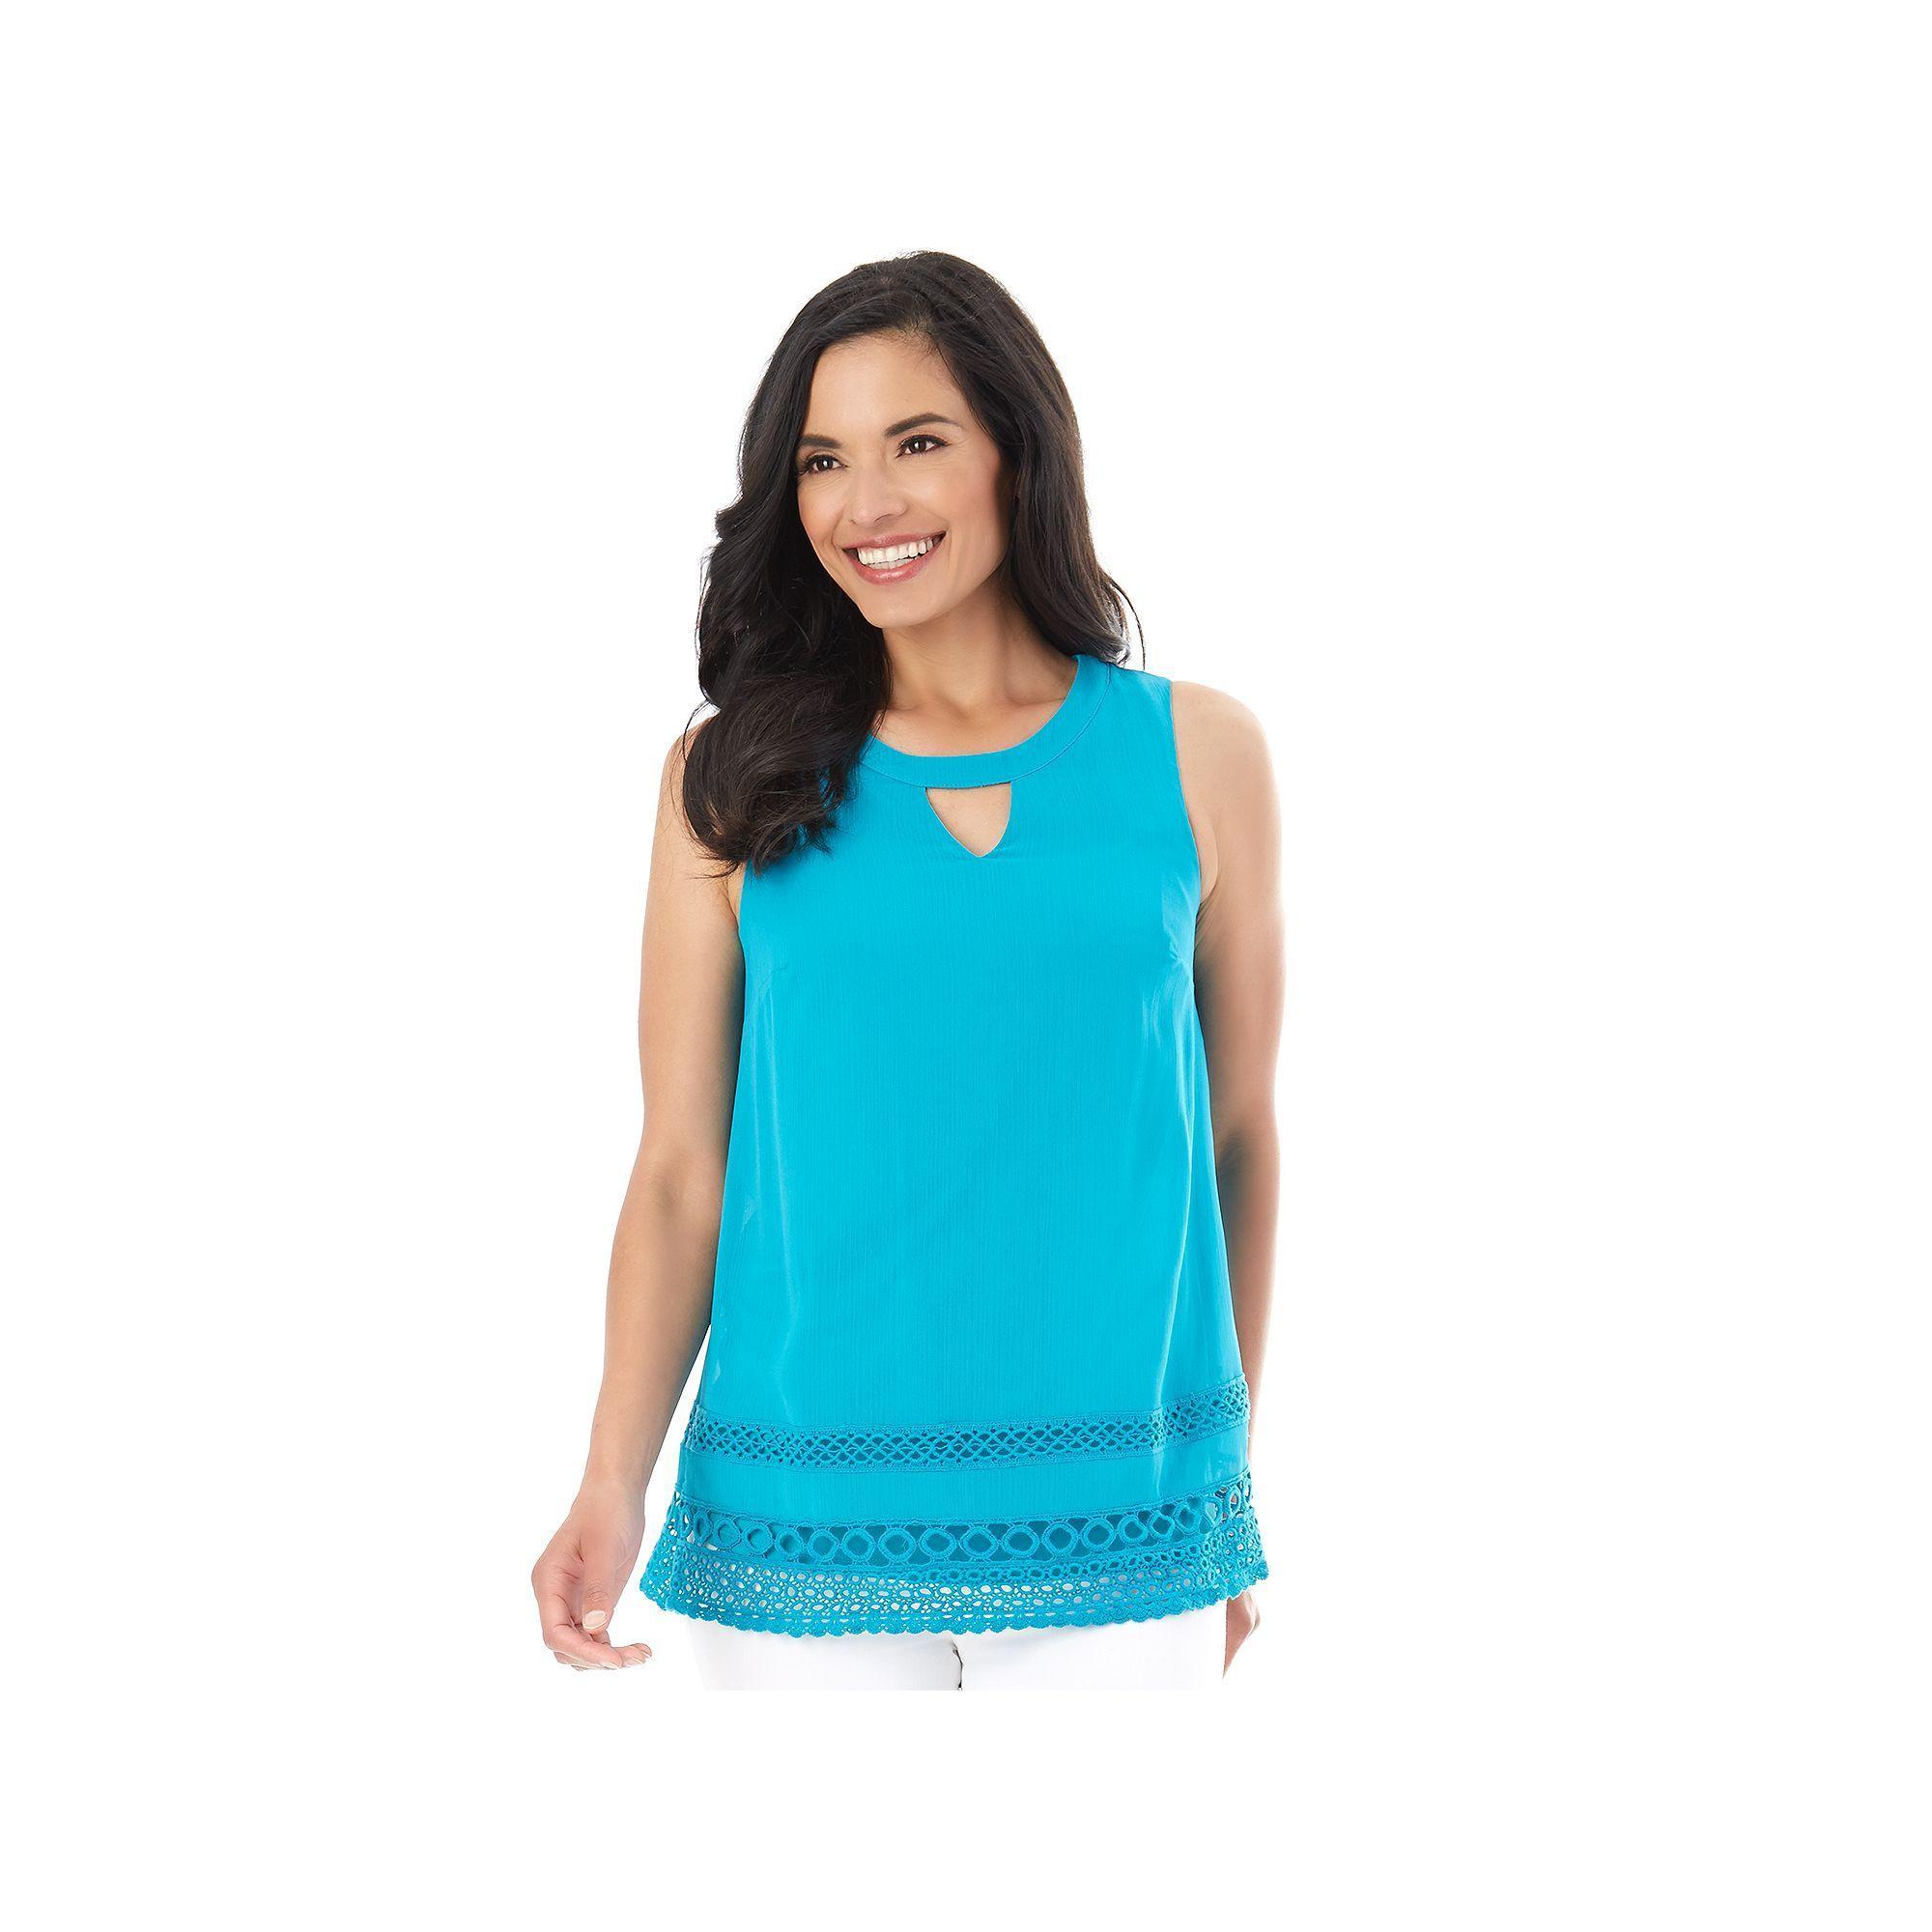 Women's AB Studio Crochet-Hem Keyhole Tank, Size: Xlrg Av/Rg, Turquoise/Blue (Turq/Aqua)